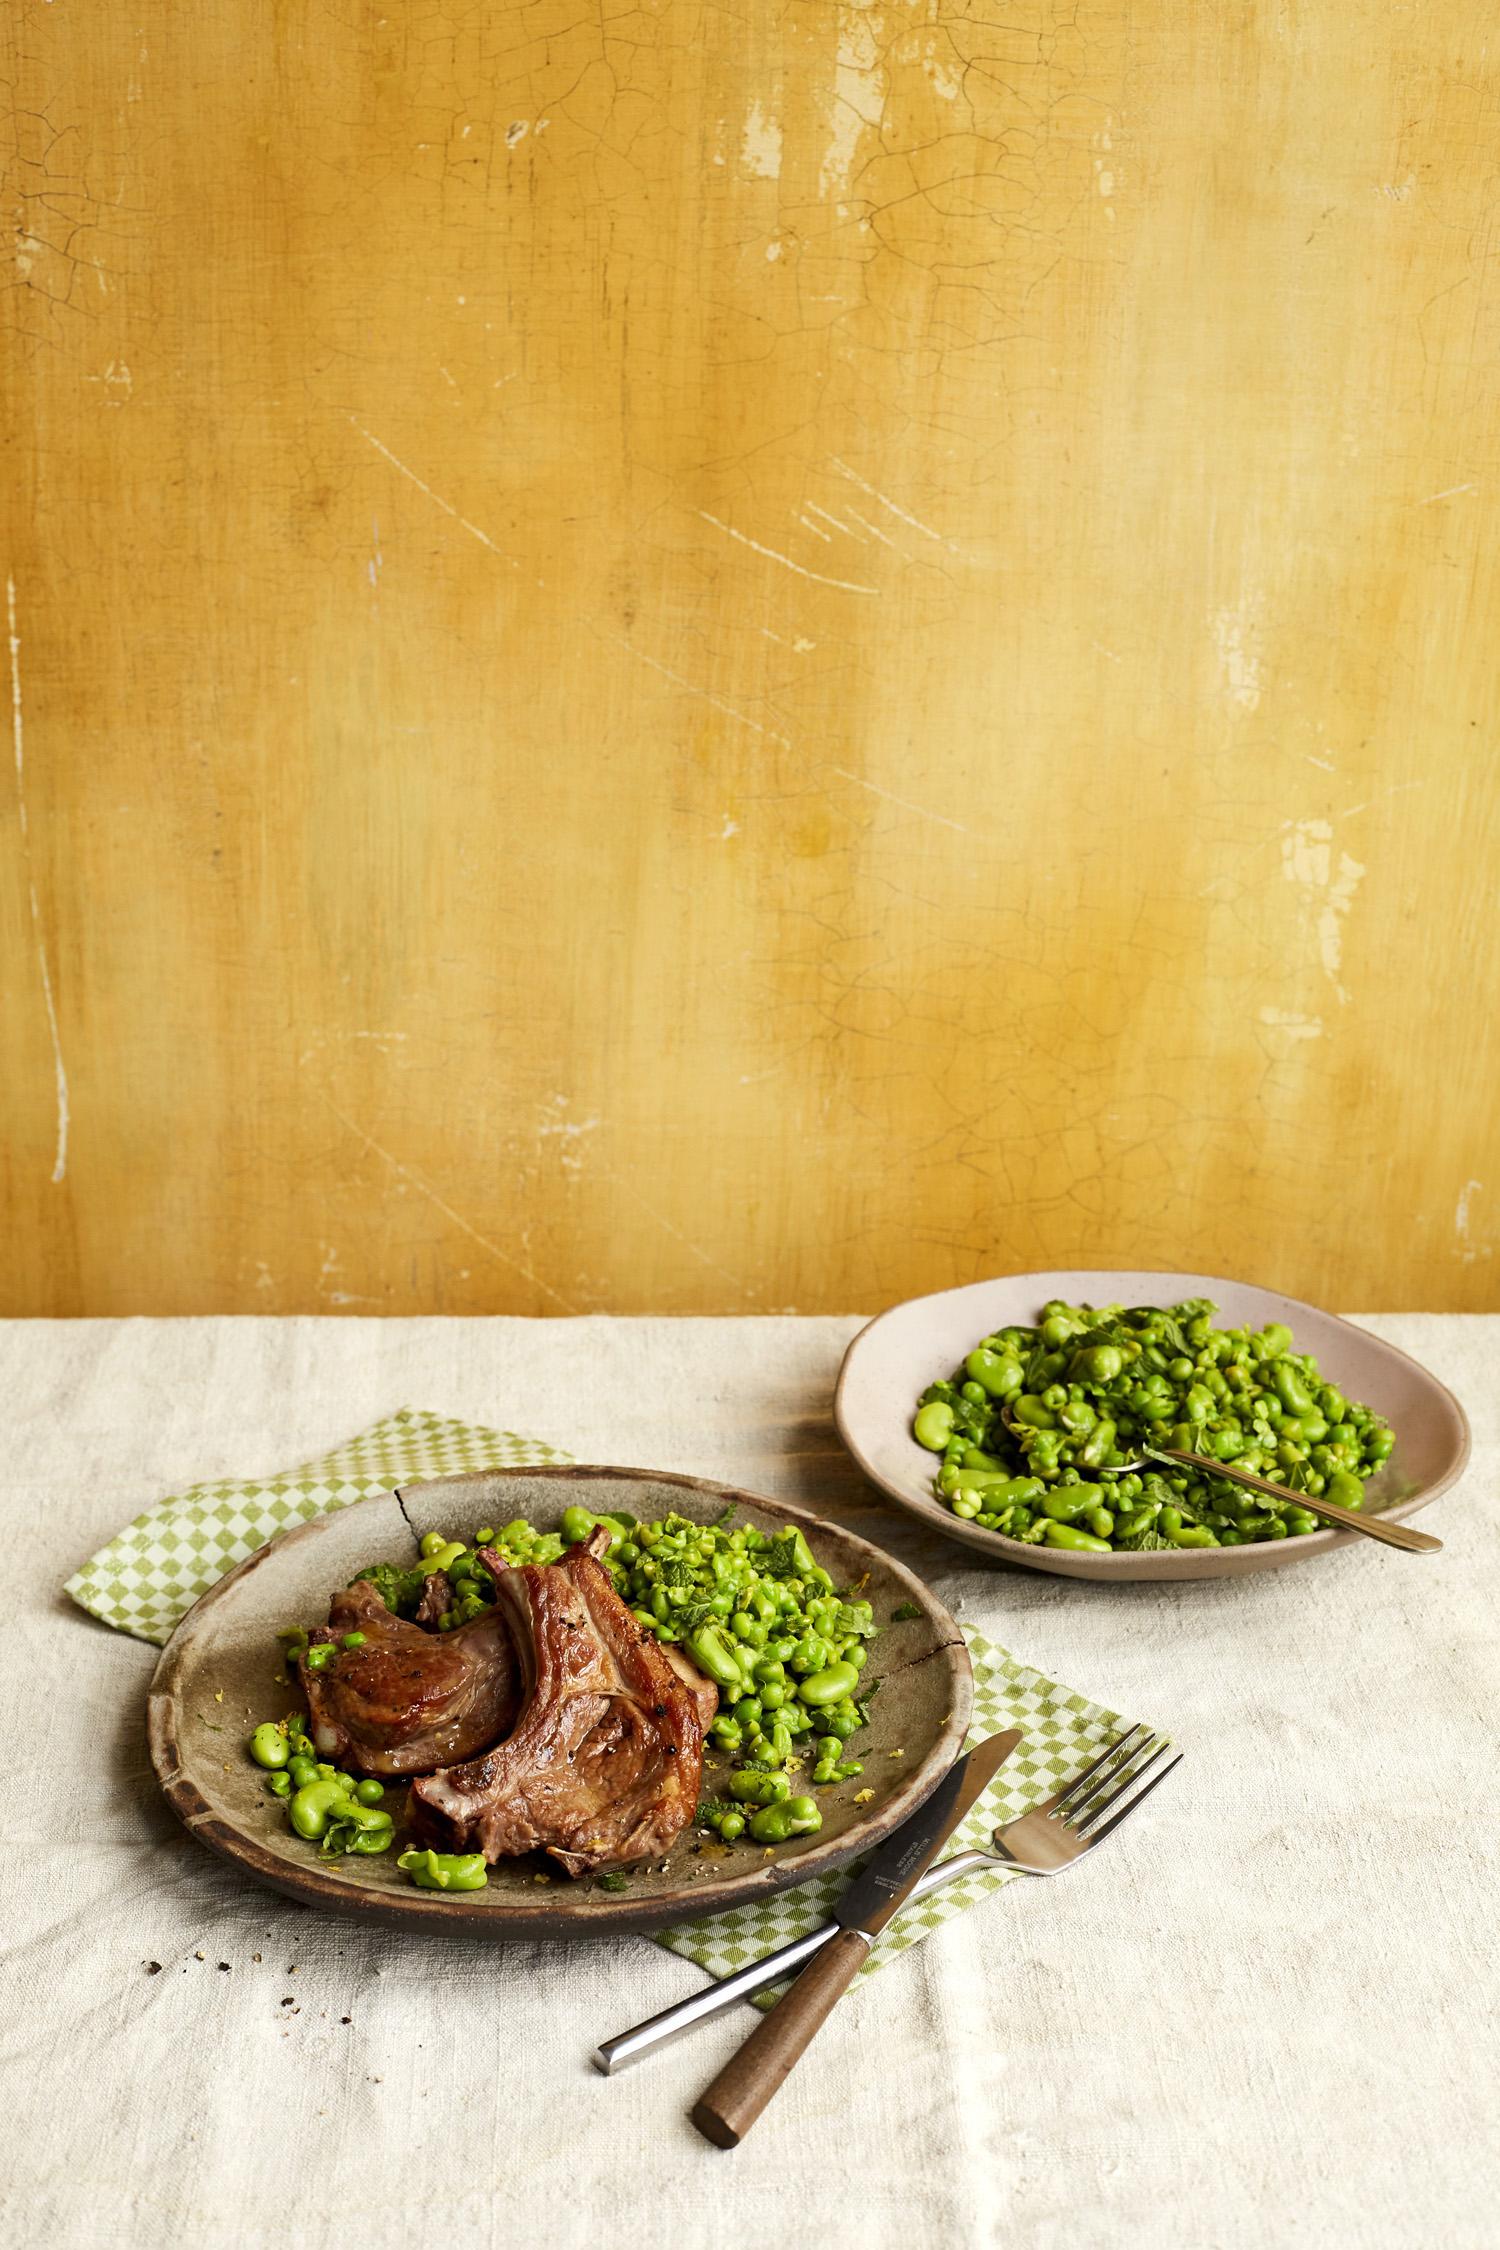 OCADO MAGAZINE Food Styling: Seiko Hatfield